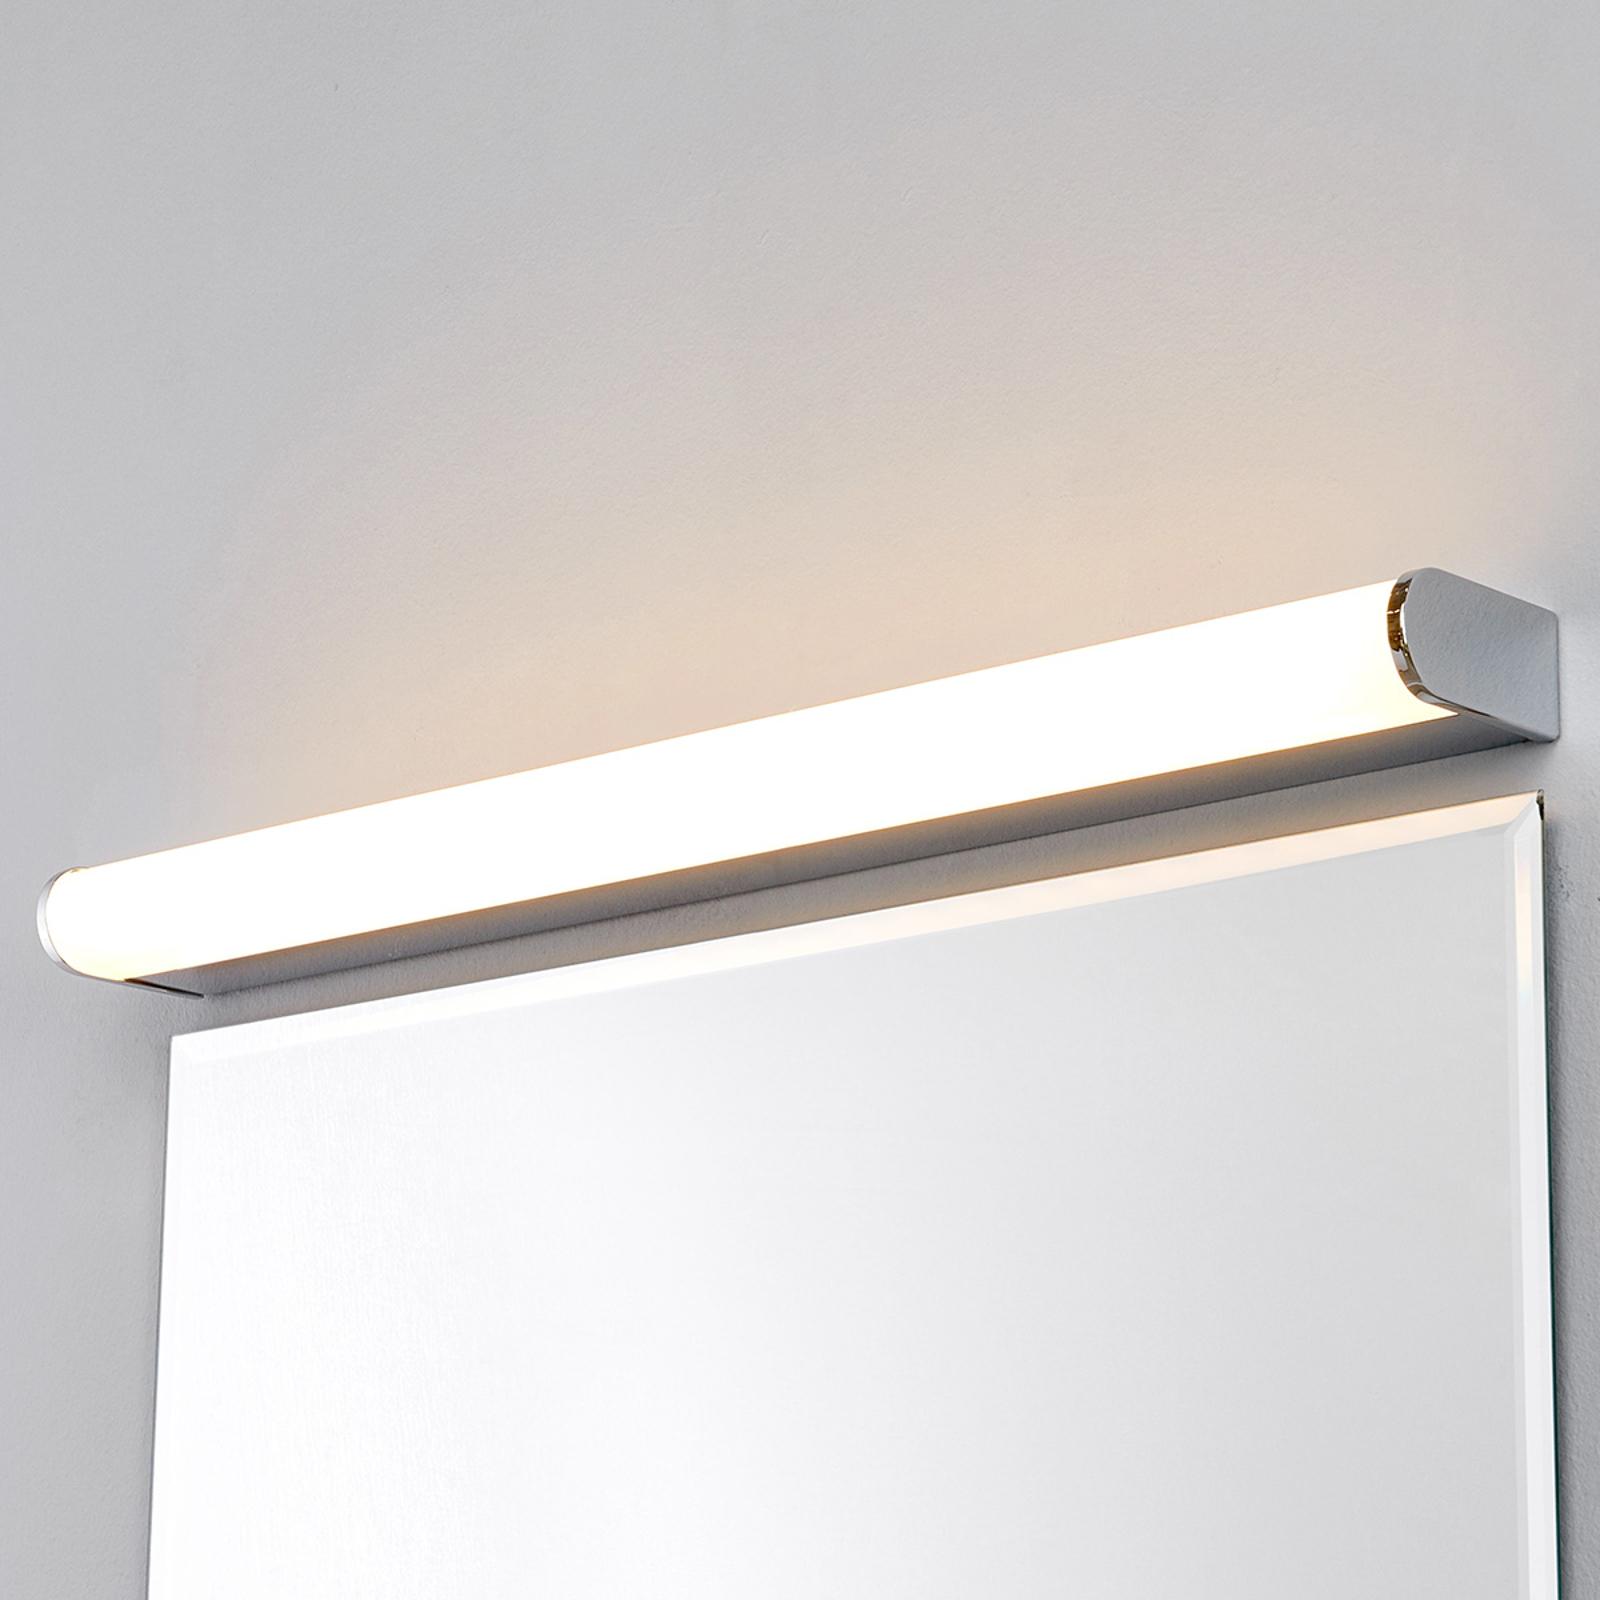 Applique miroir bain LED Philippa demi-ronde 58cm